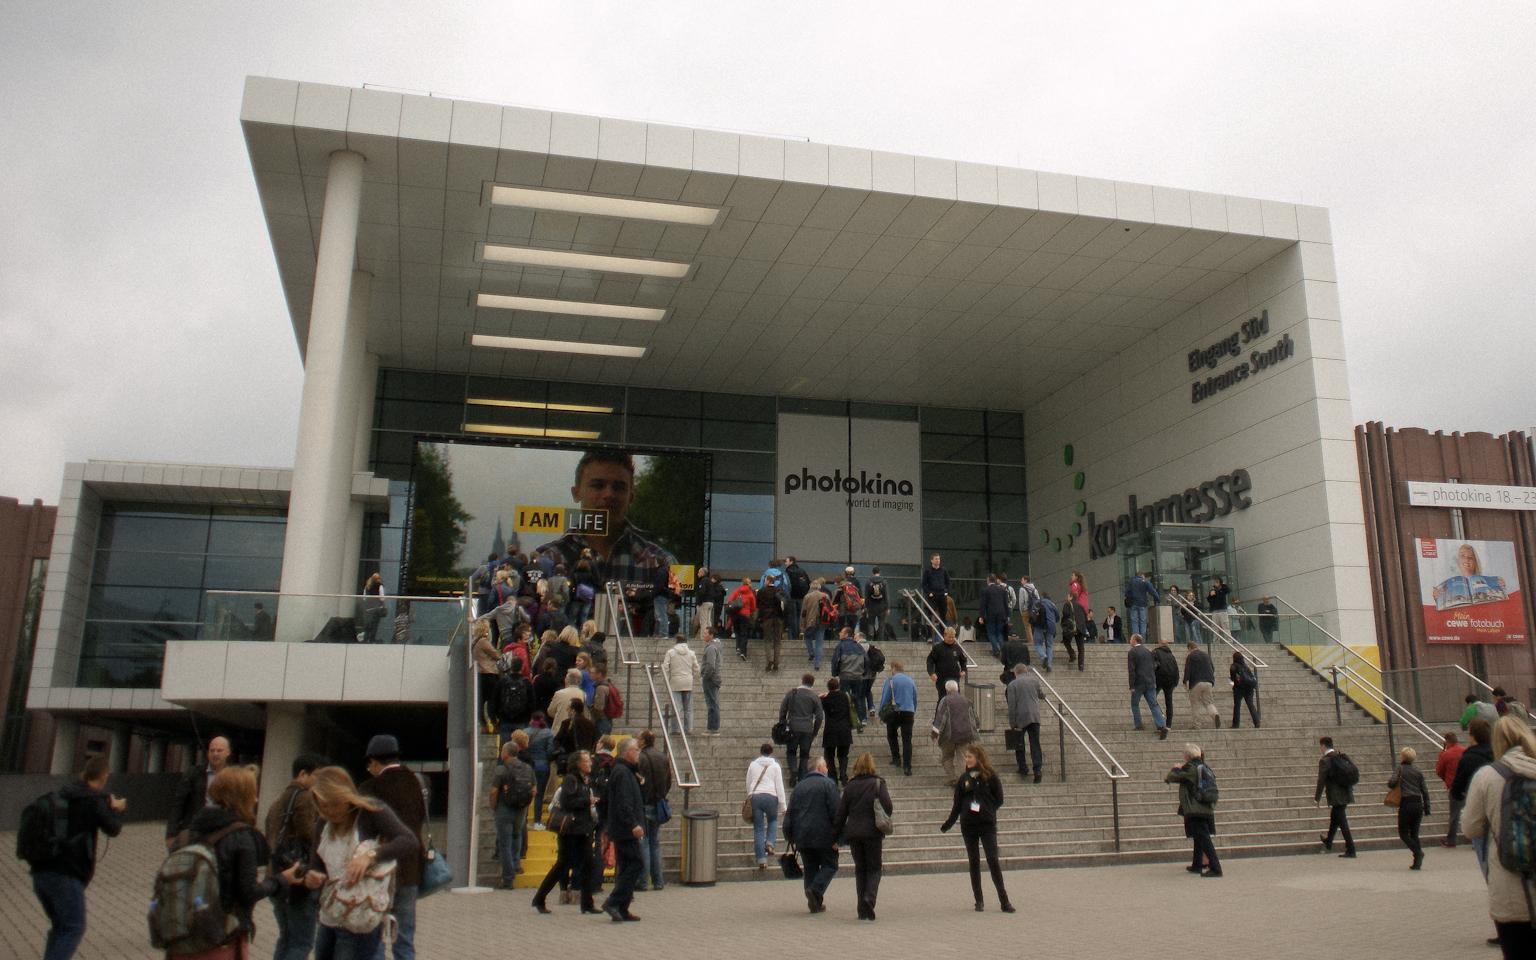 Messe Köln Eingang Ost